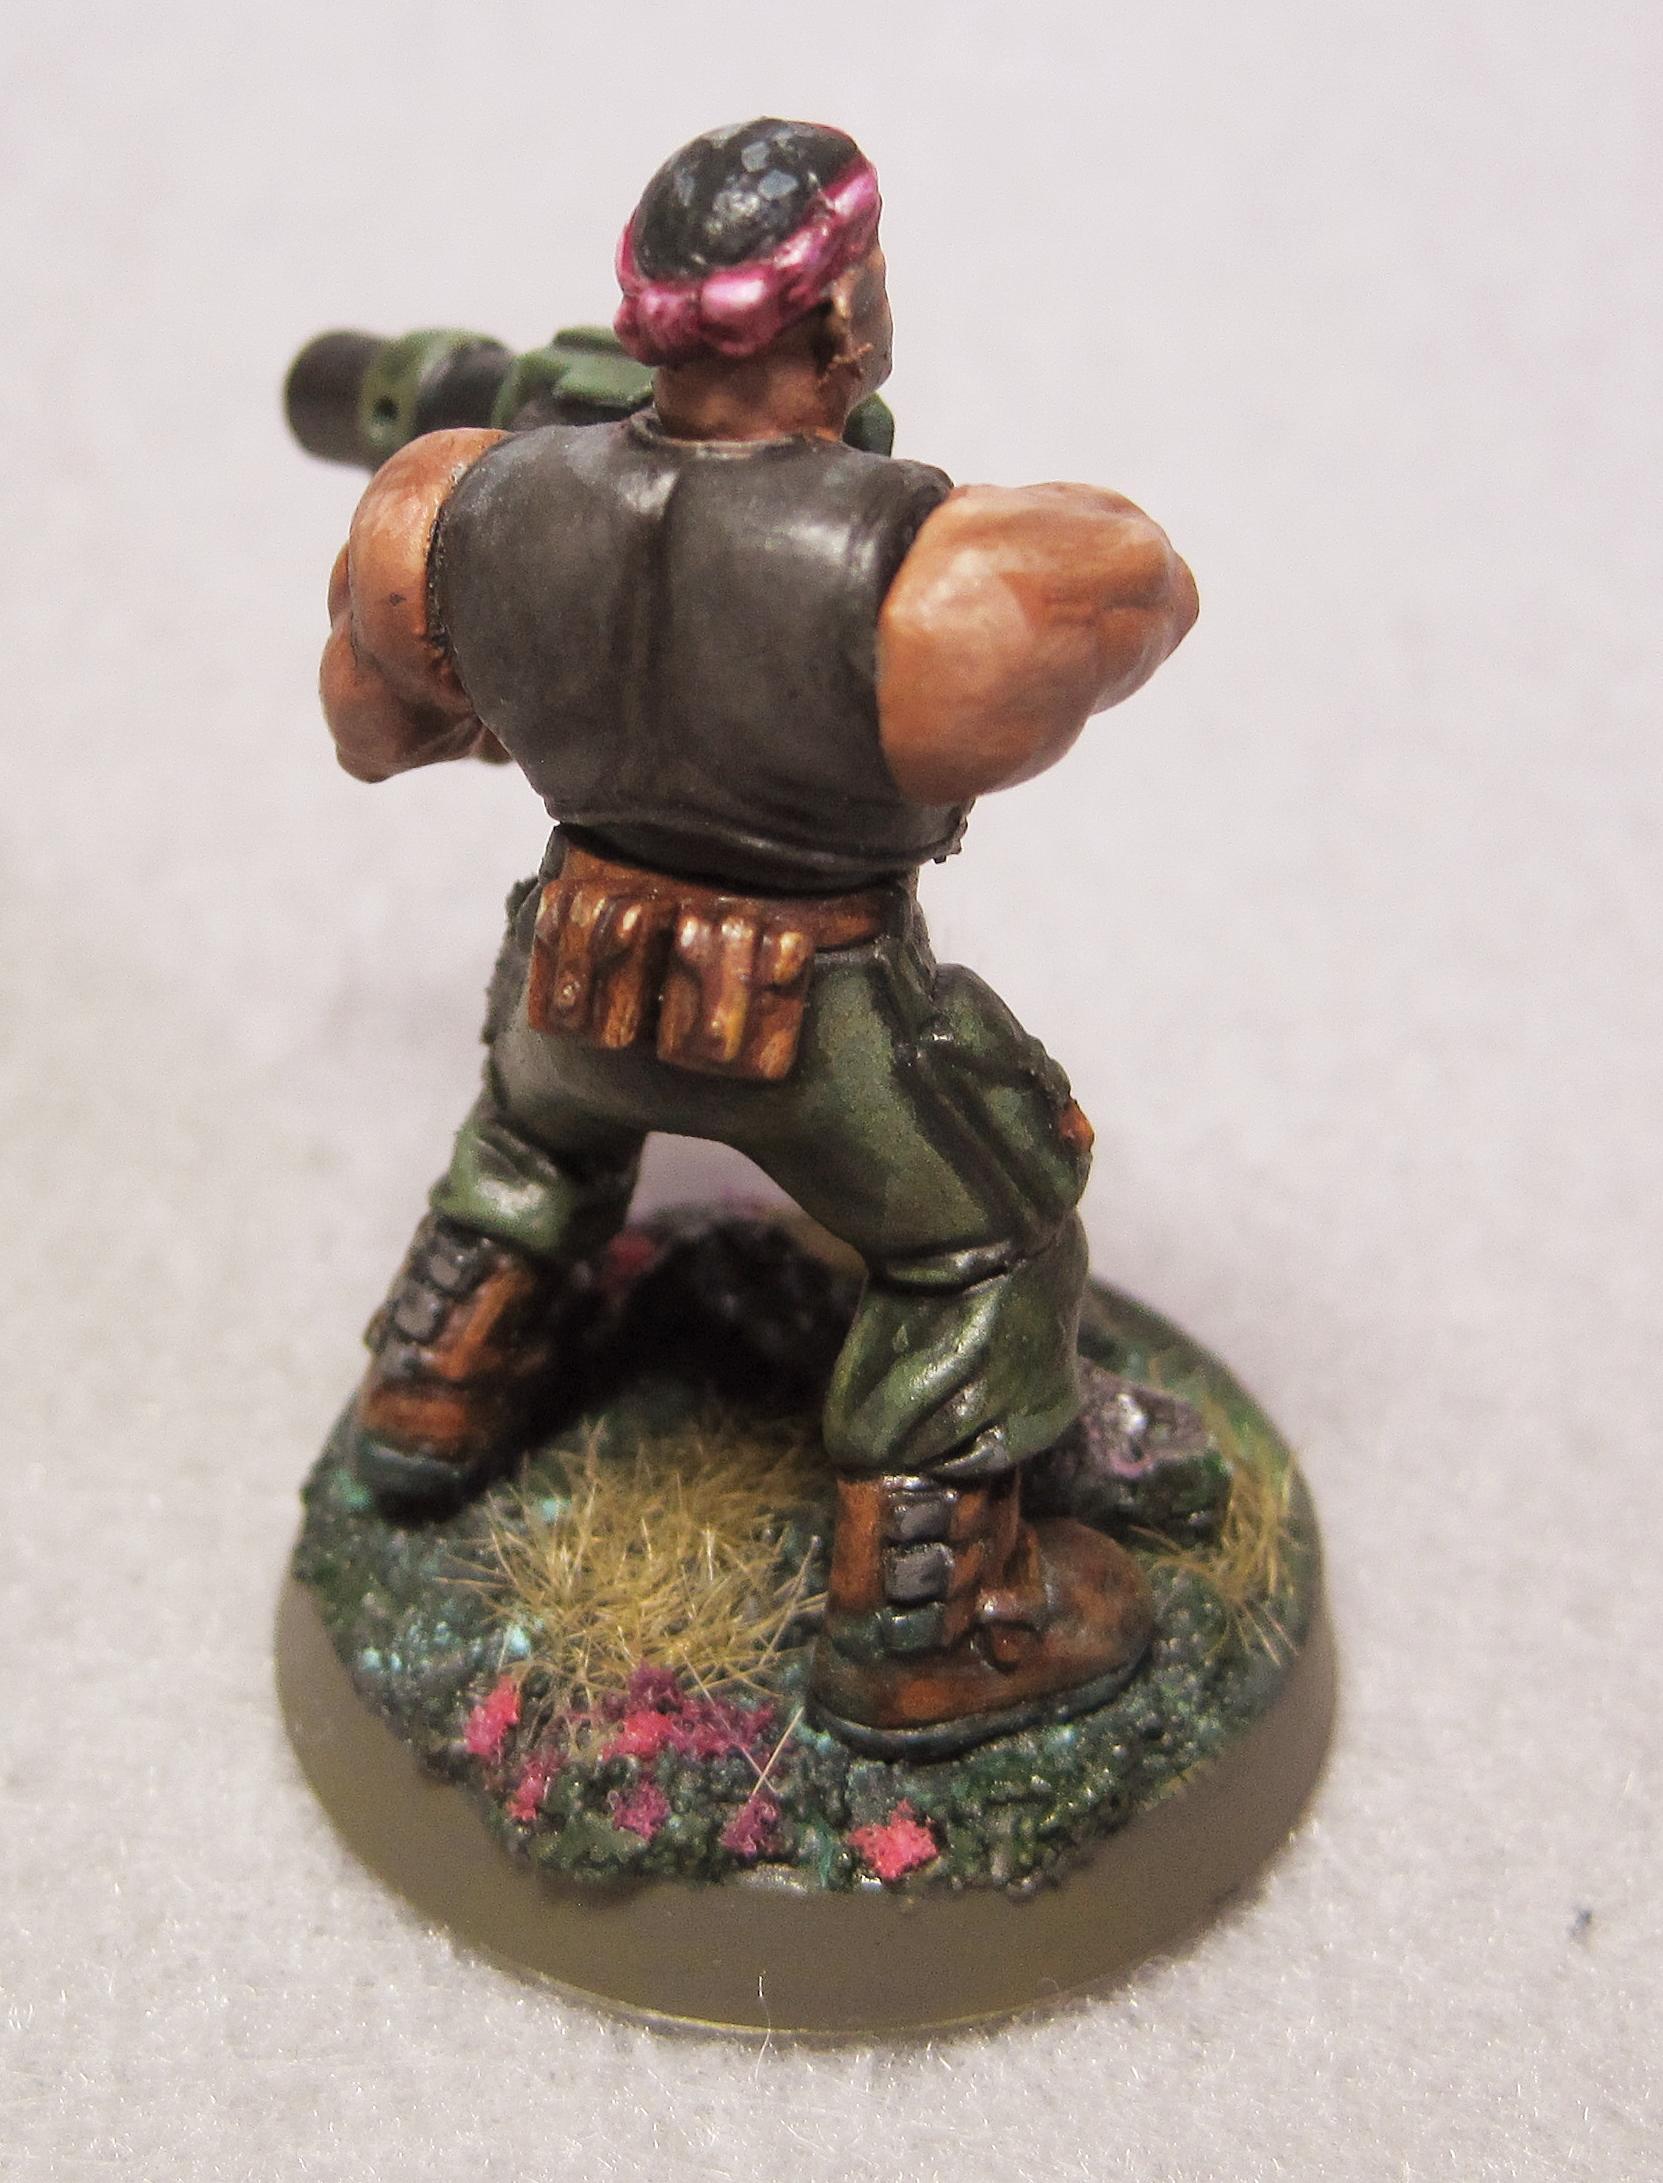 Imperial Guard, Inquisitor, Veteran, Warhammer 40,000